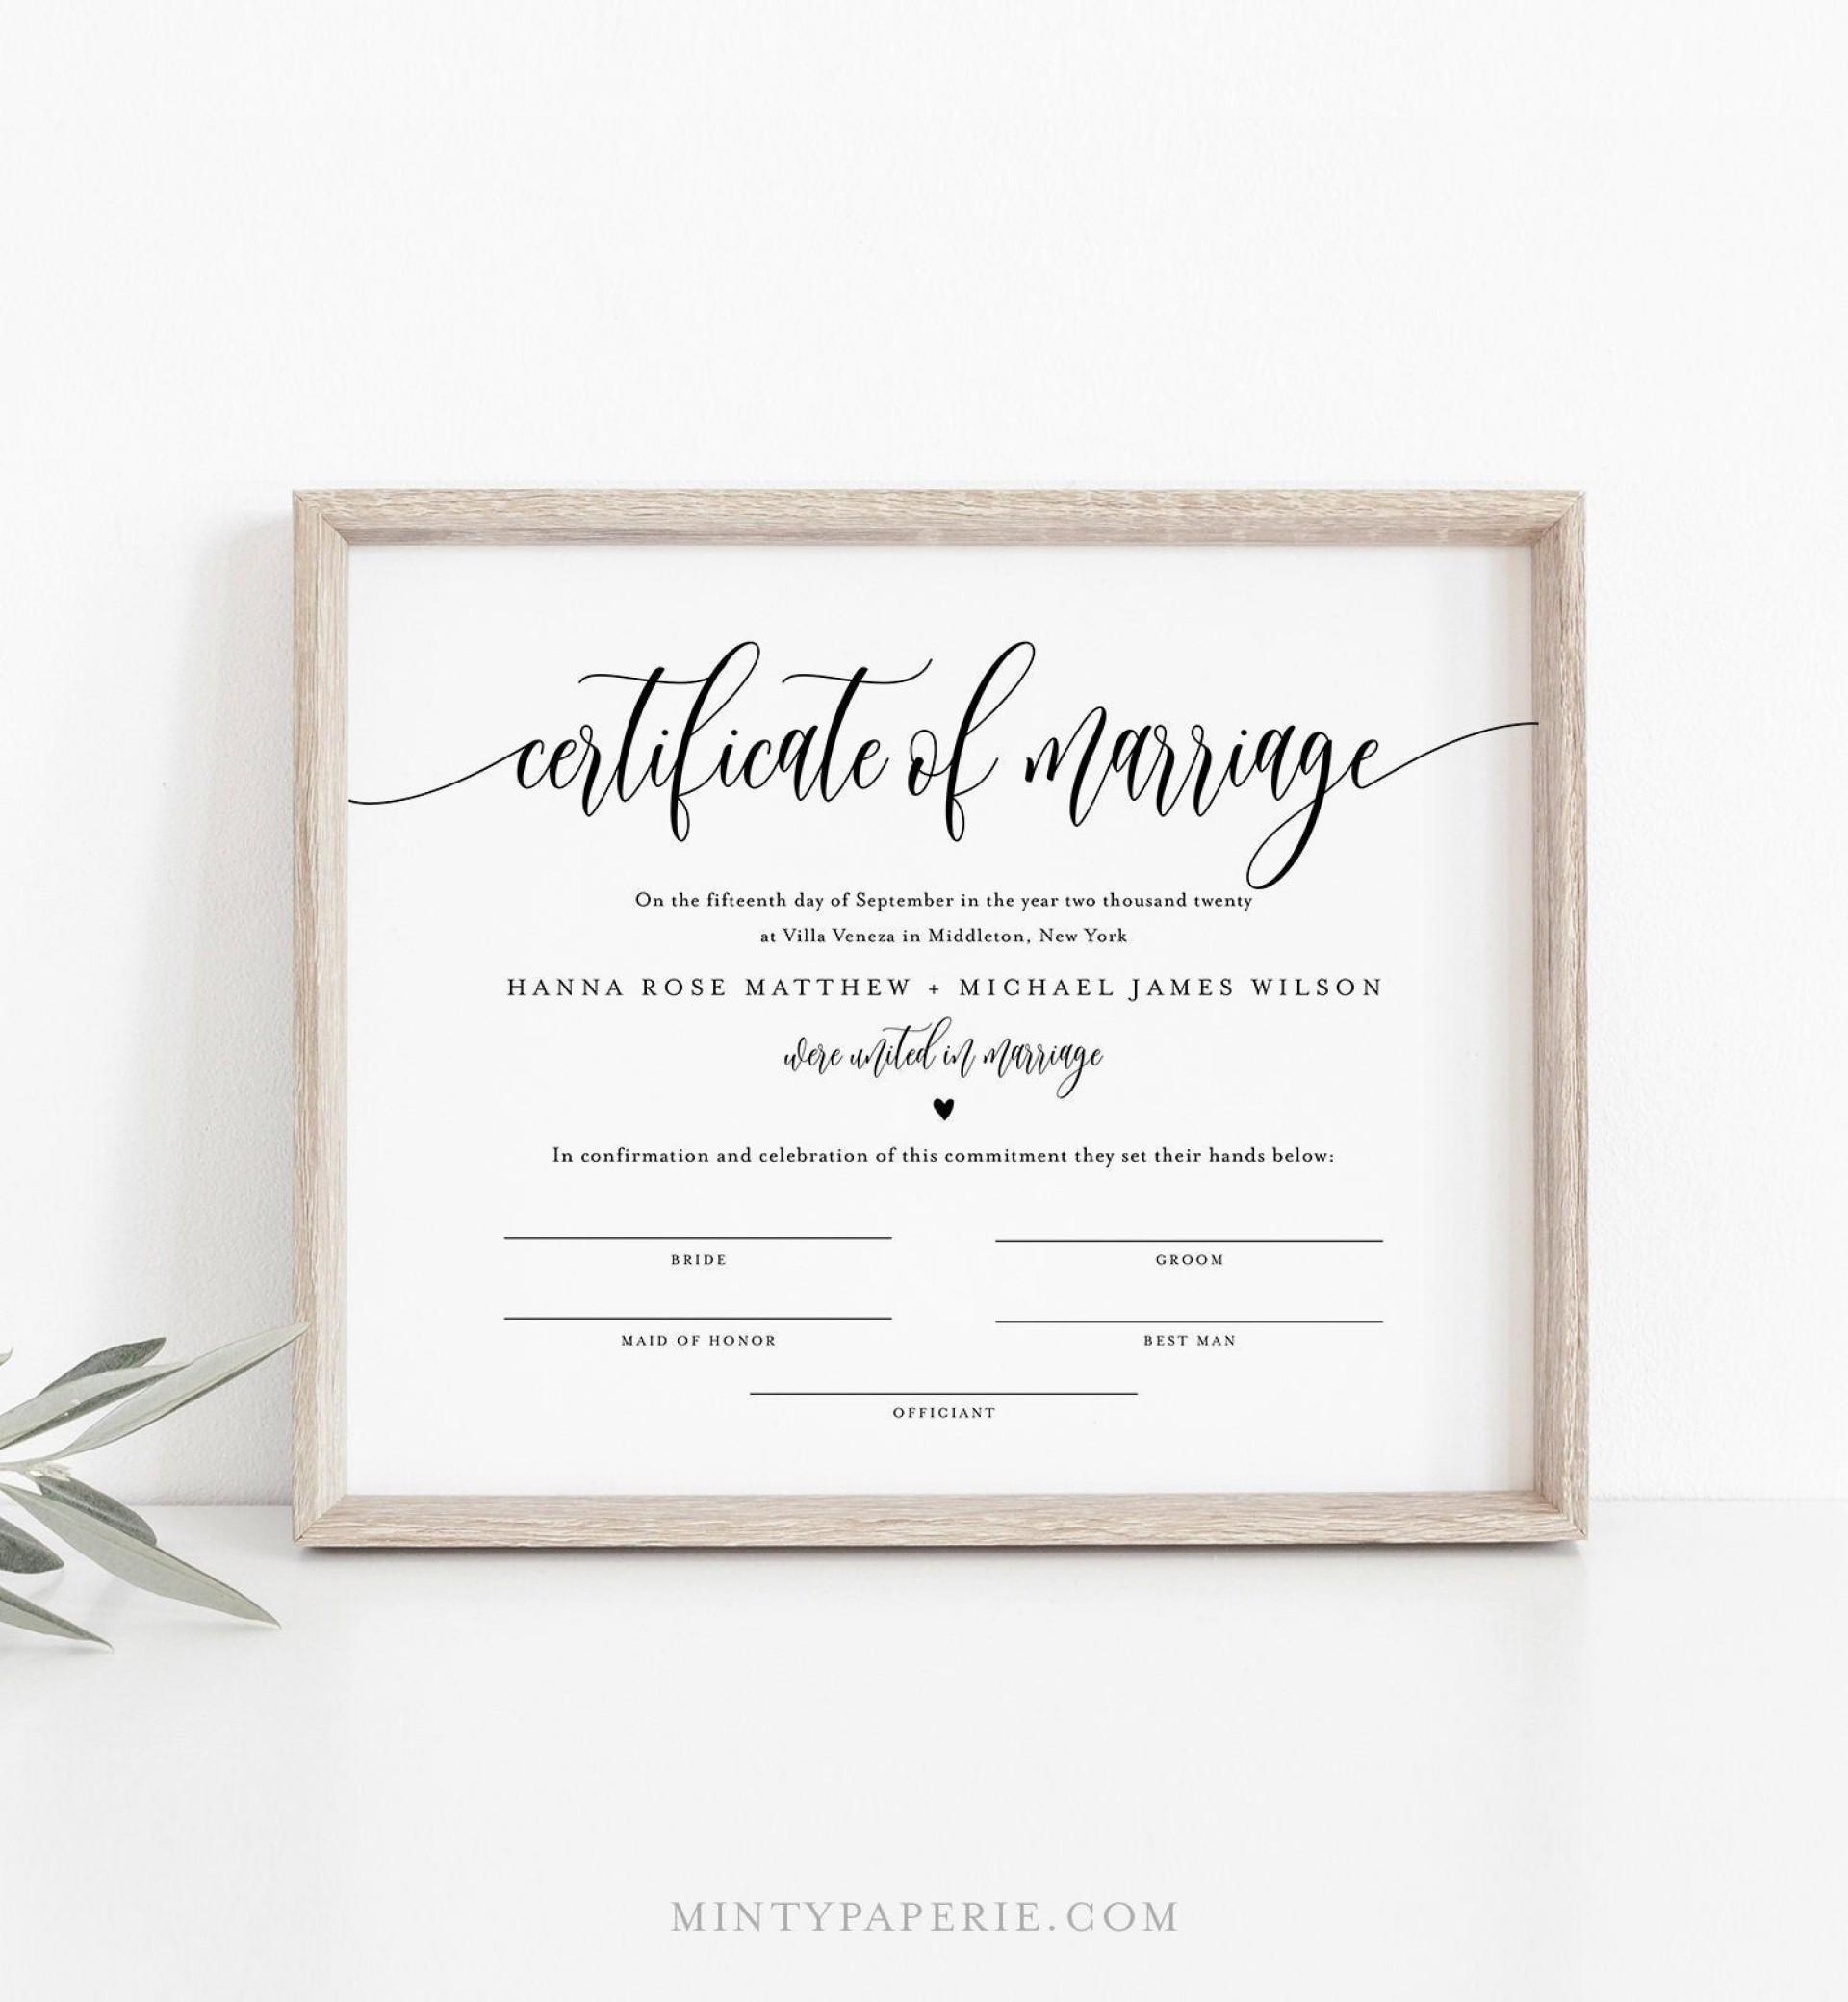 007 Stirring Certificate Of Marriage Template Sample  Word Australia1920